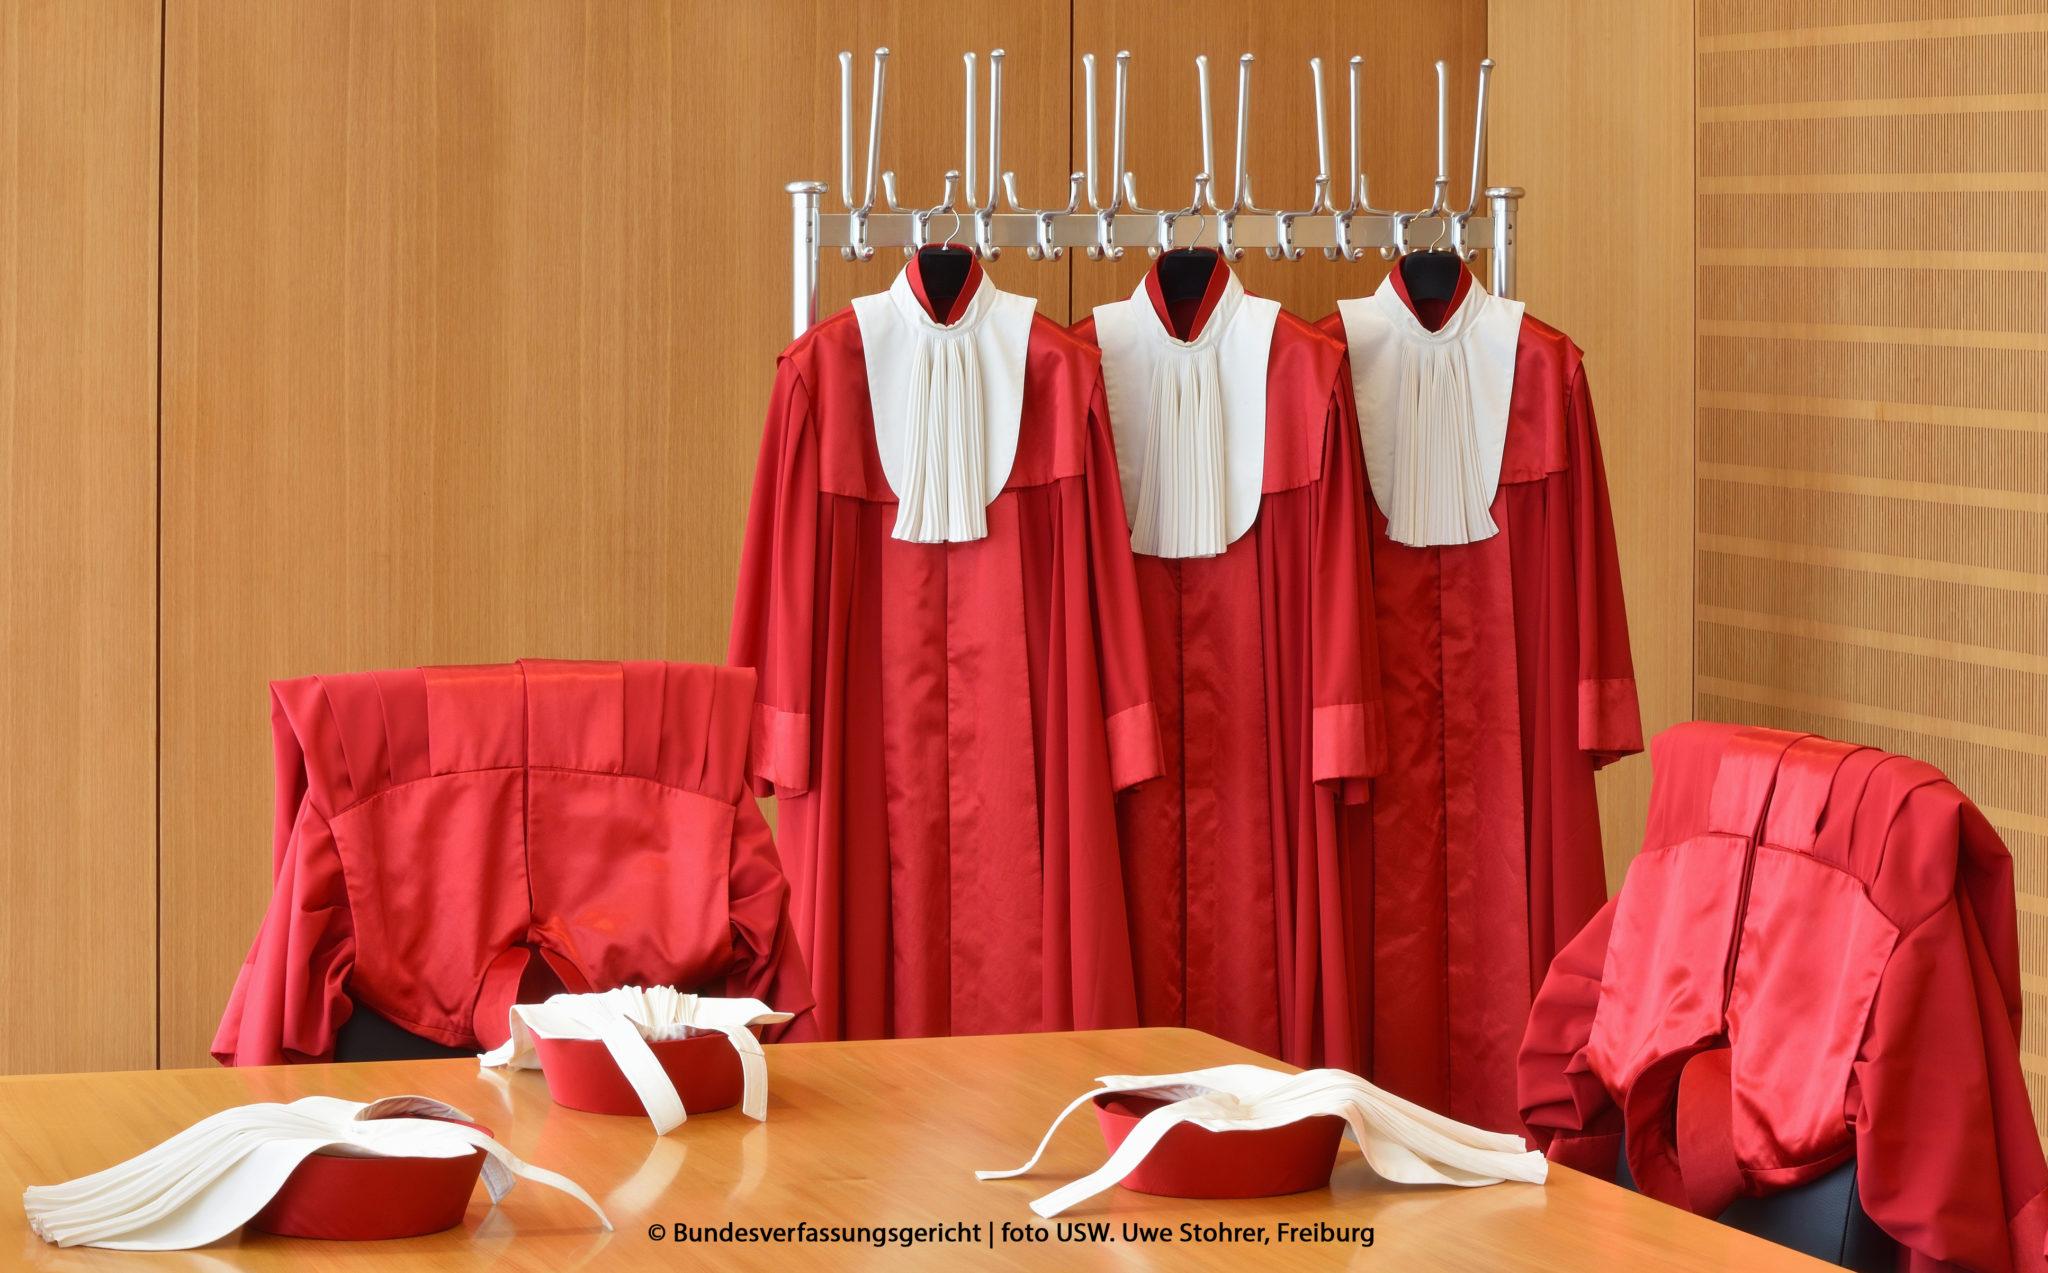 Rote Roben